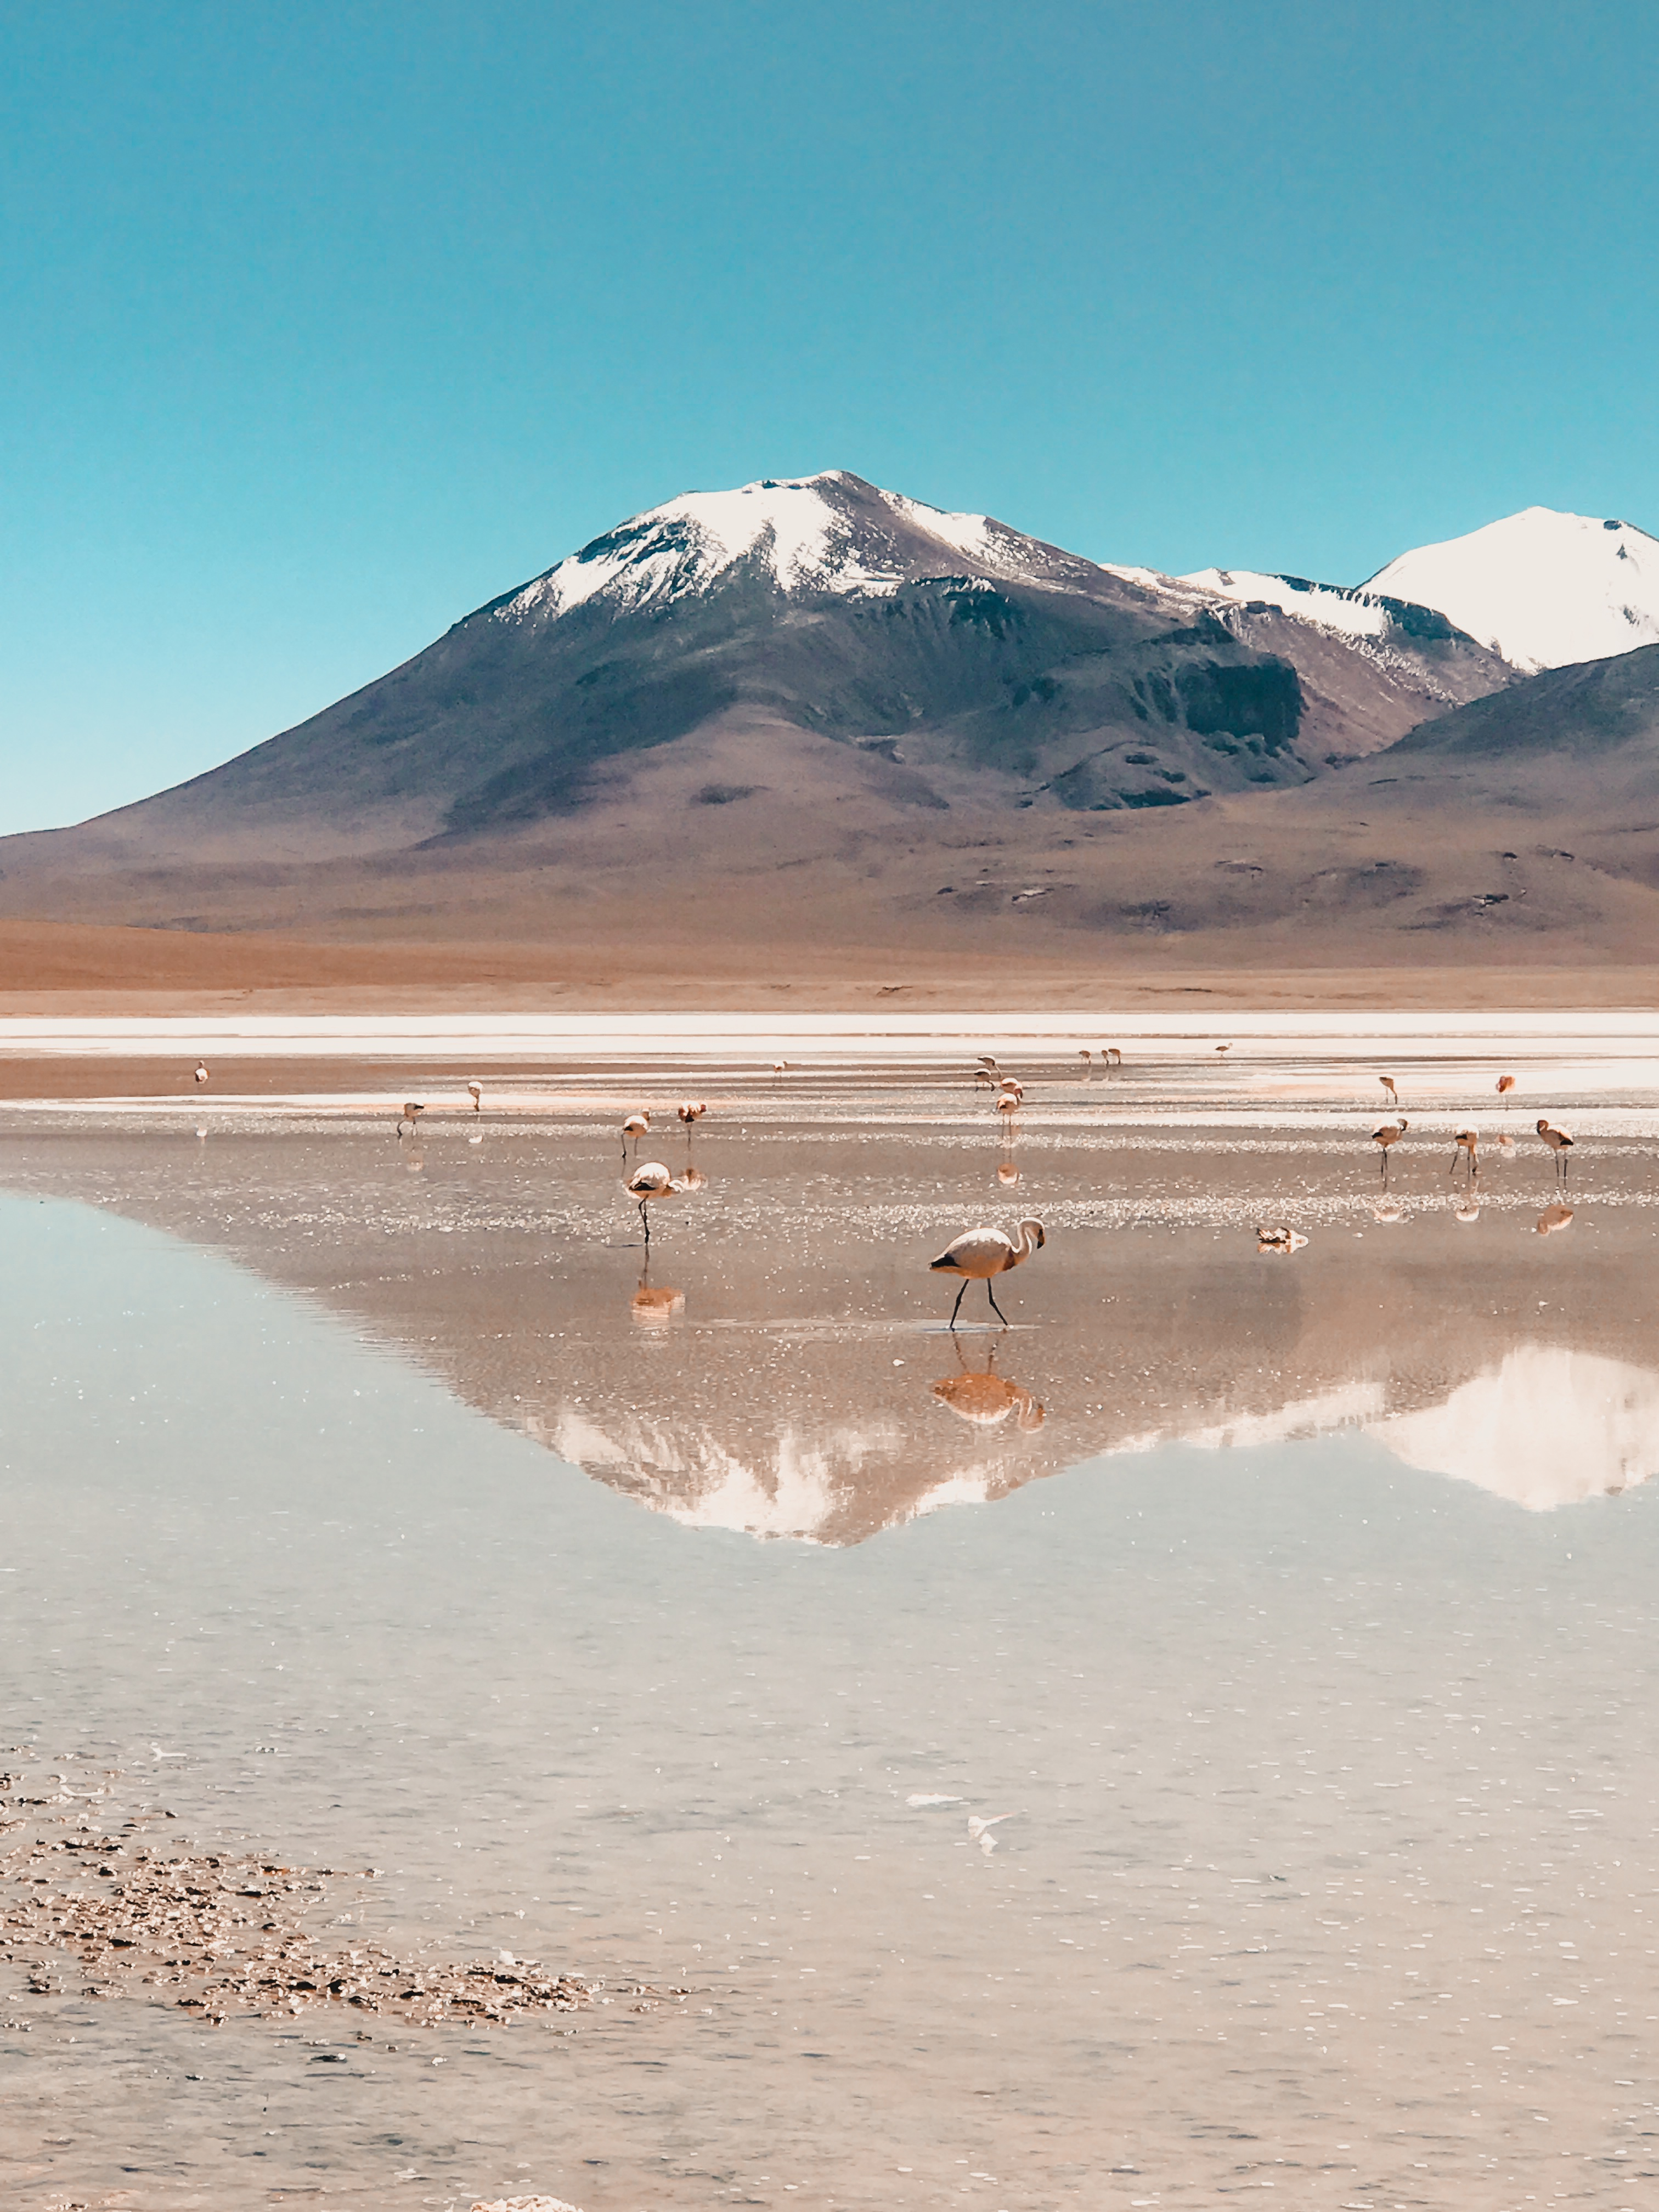 Reflection of flamingos in lake in Bolivian desert